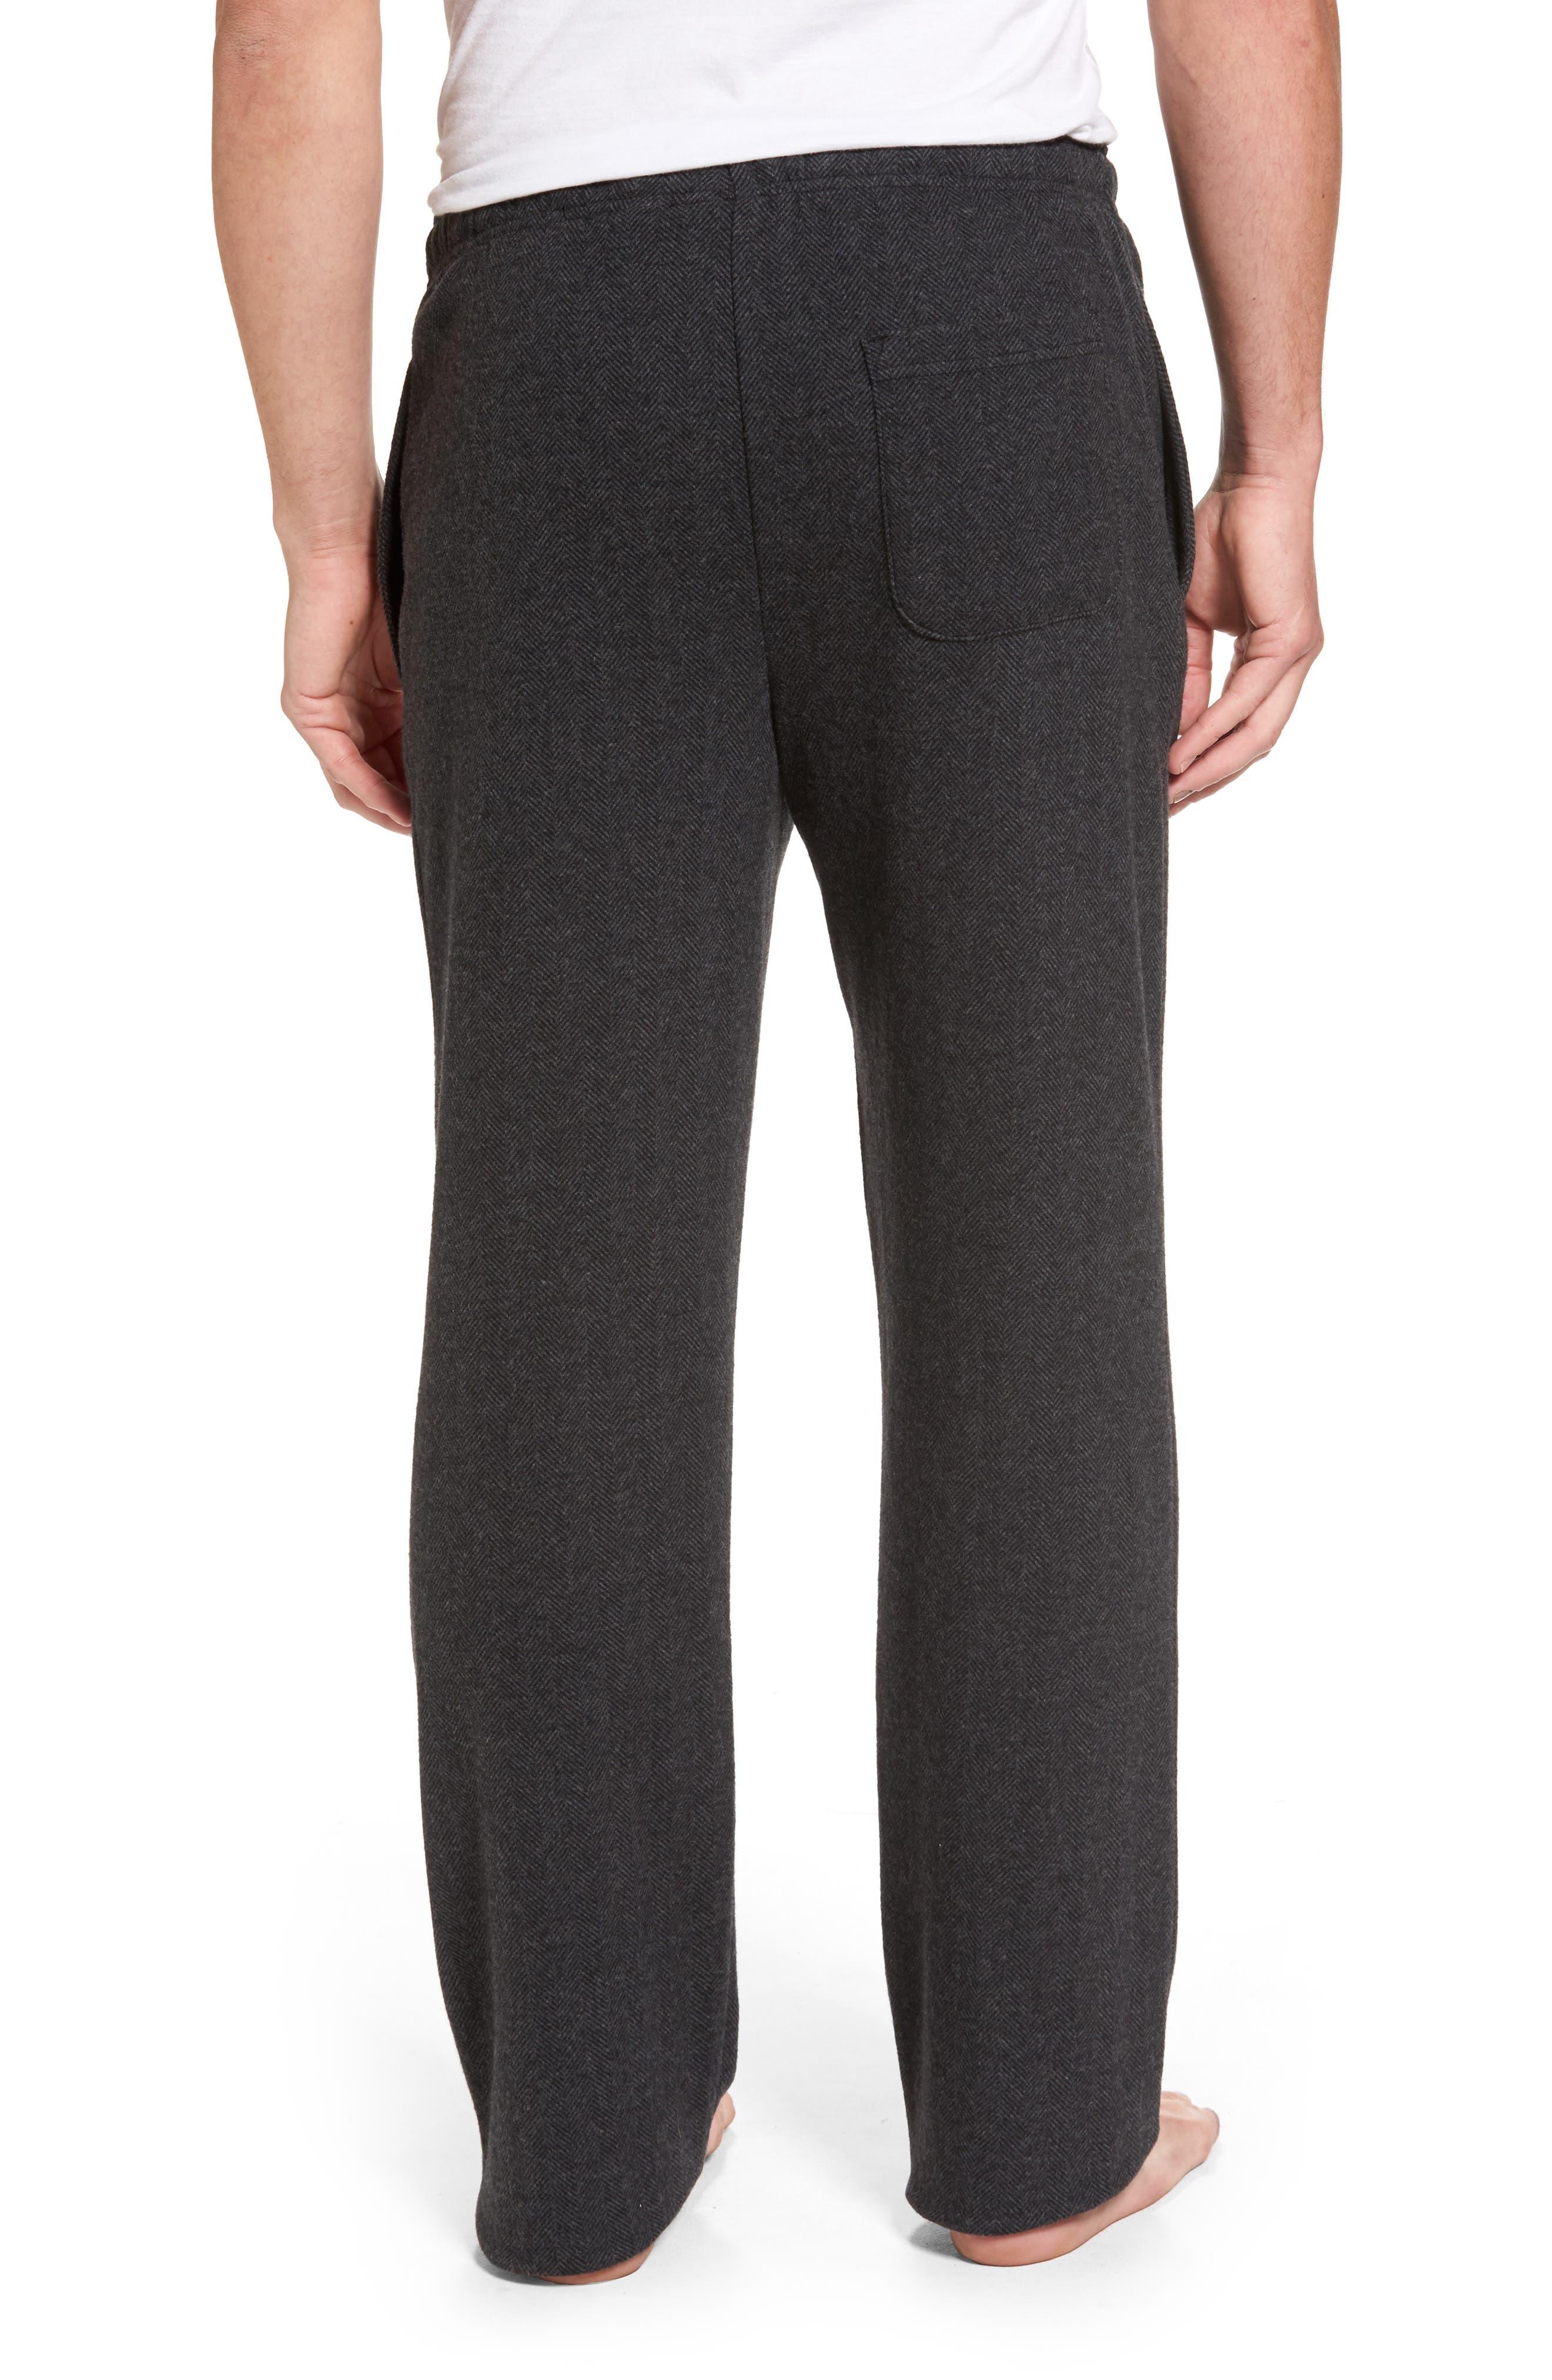 Grayson Lounge Pants,                             Alternate thumbnail 2, color,                             Charcoal